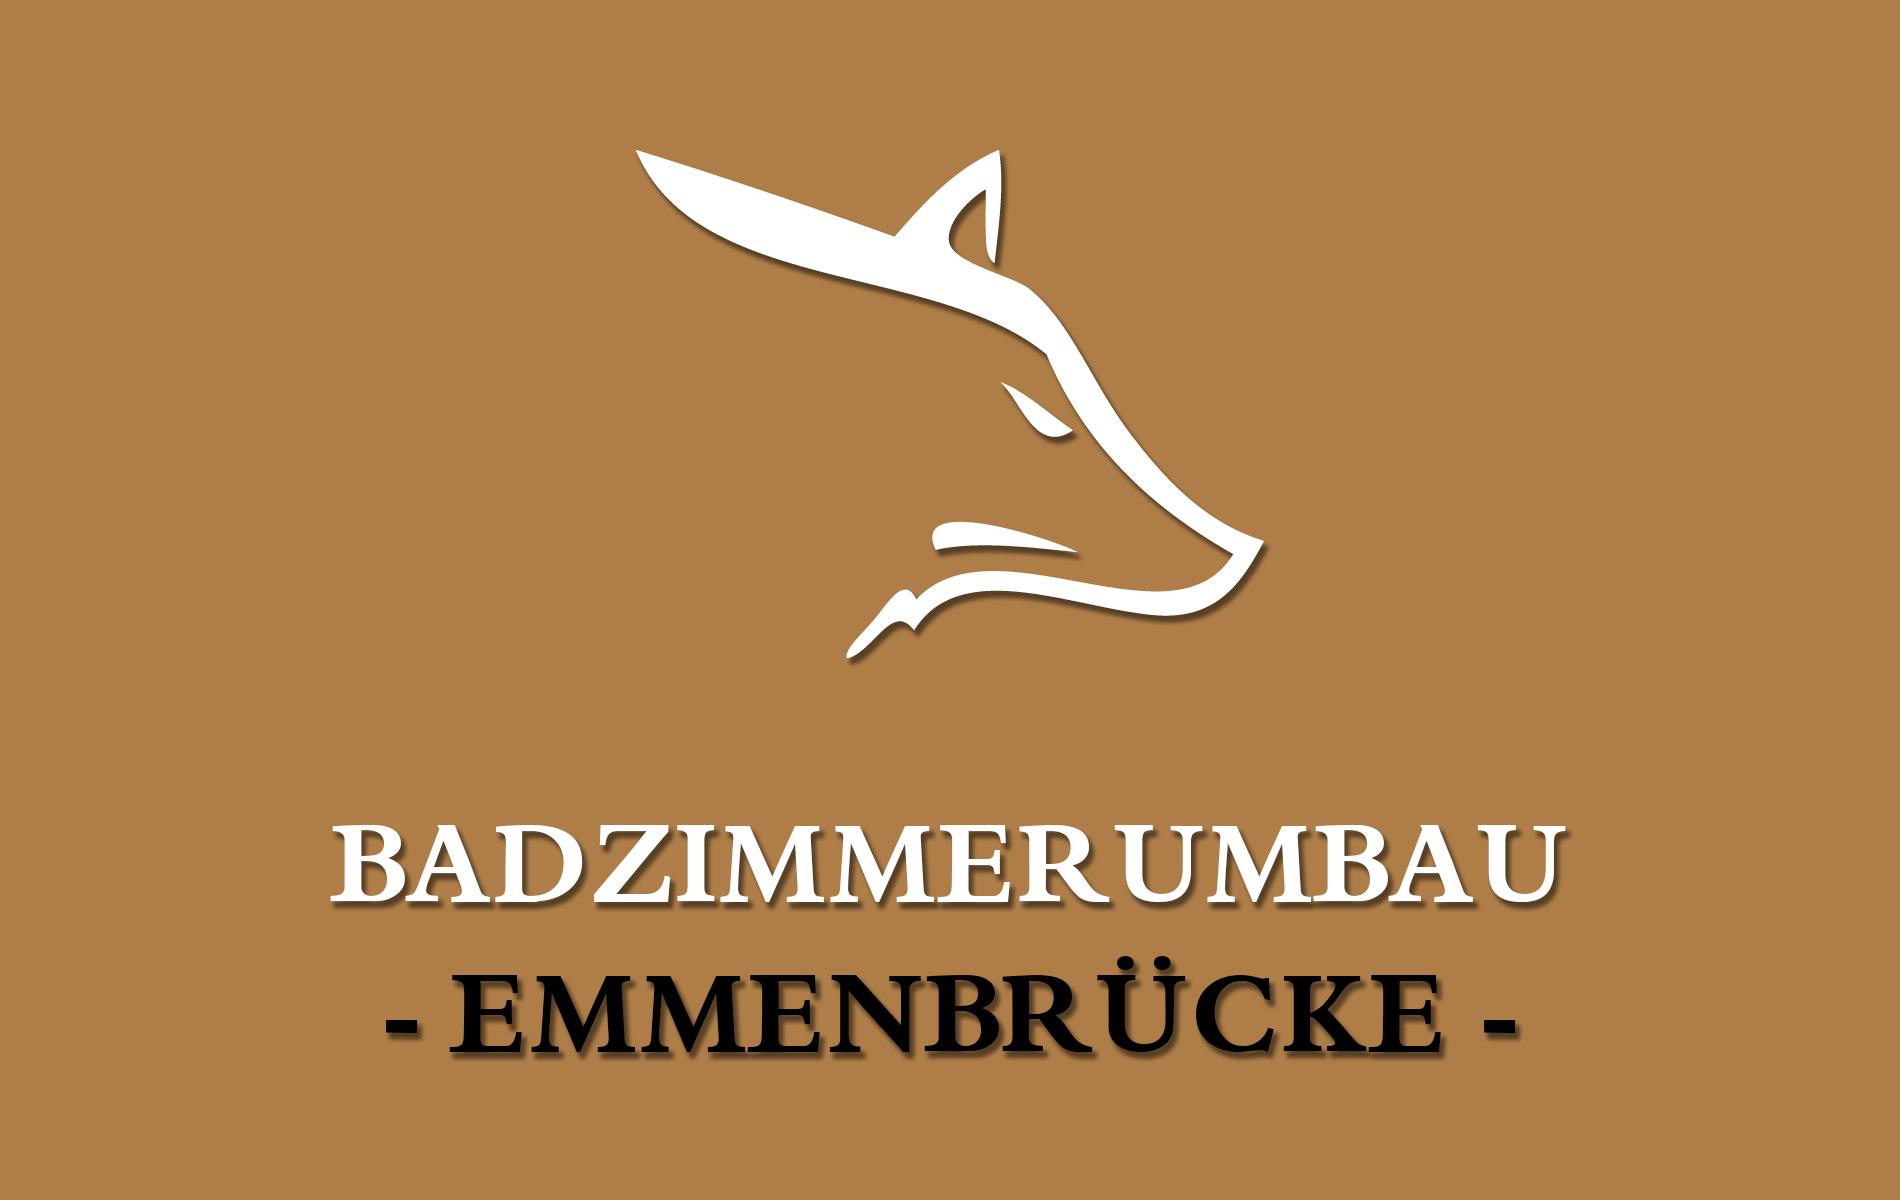 Badzimmerumbau Emmenbrücke